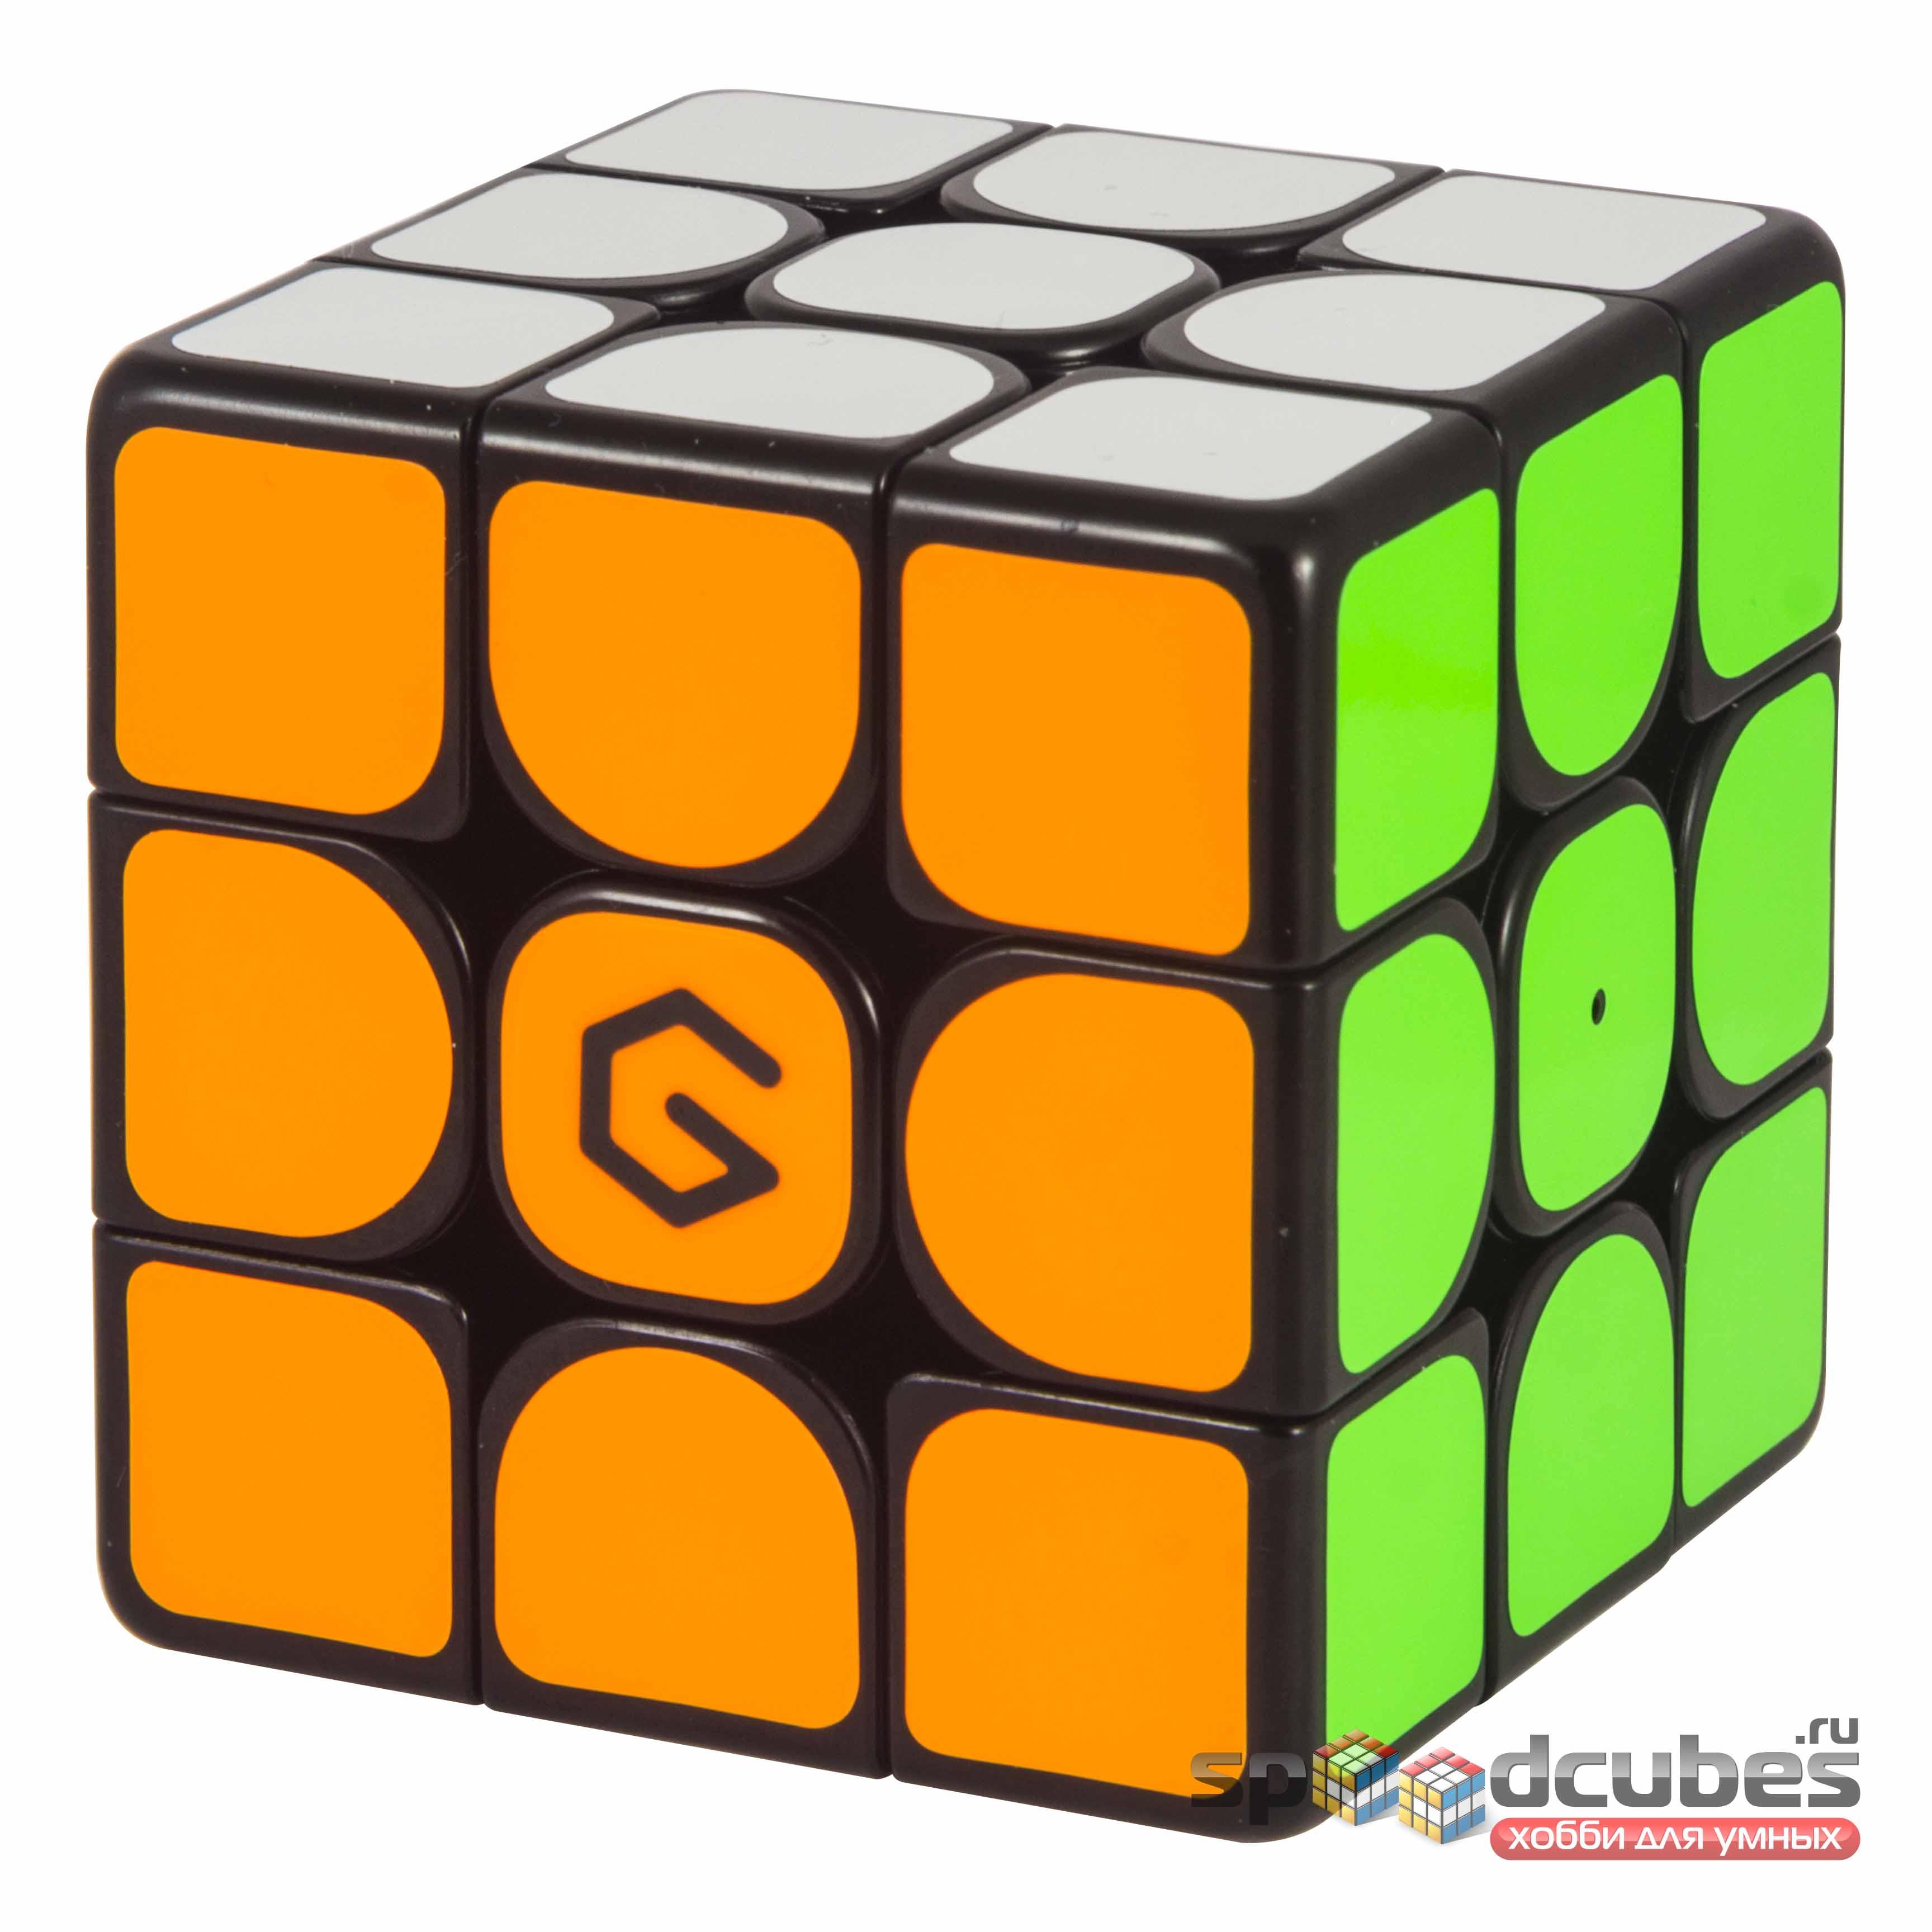 Xiaomi Giiker Super Cube I3S (v2)